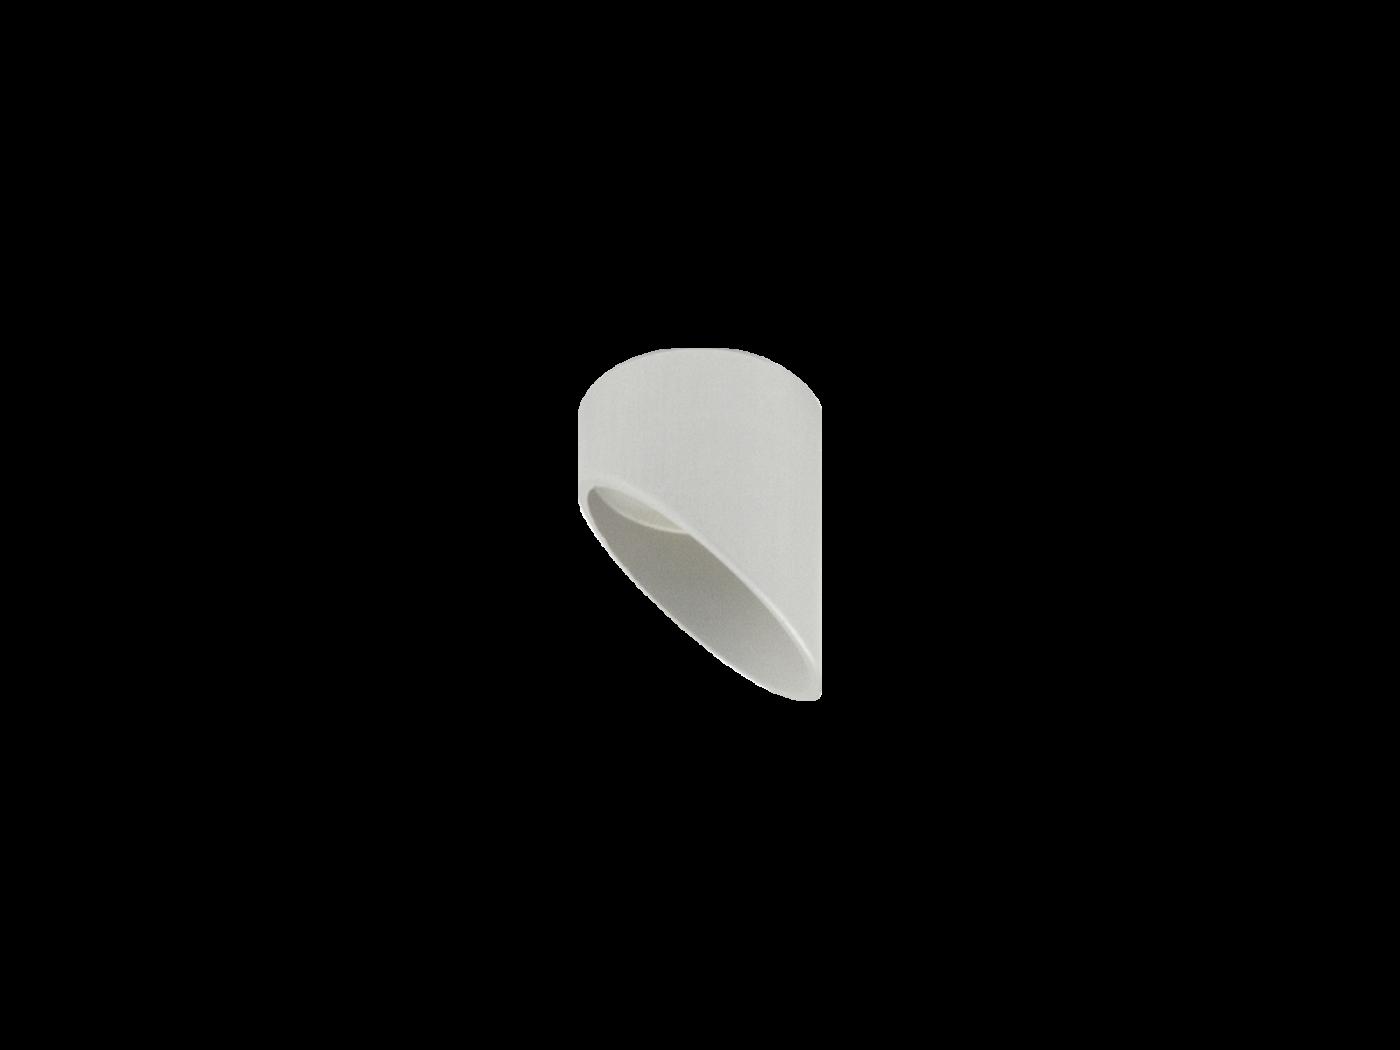 Highline_Diagonal_3K_Al_1600x1200